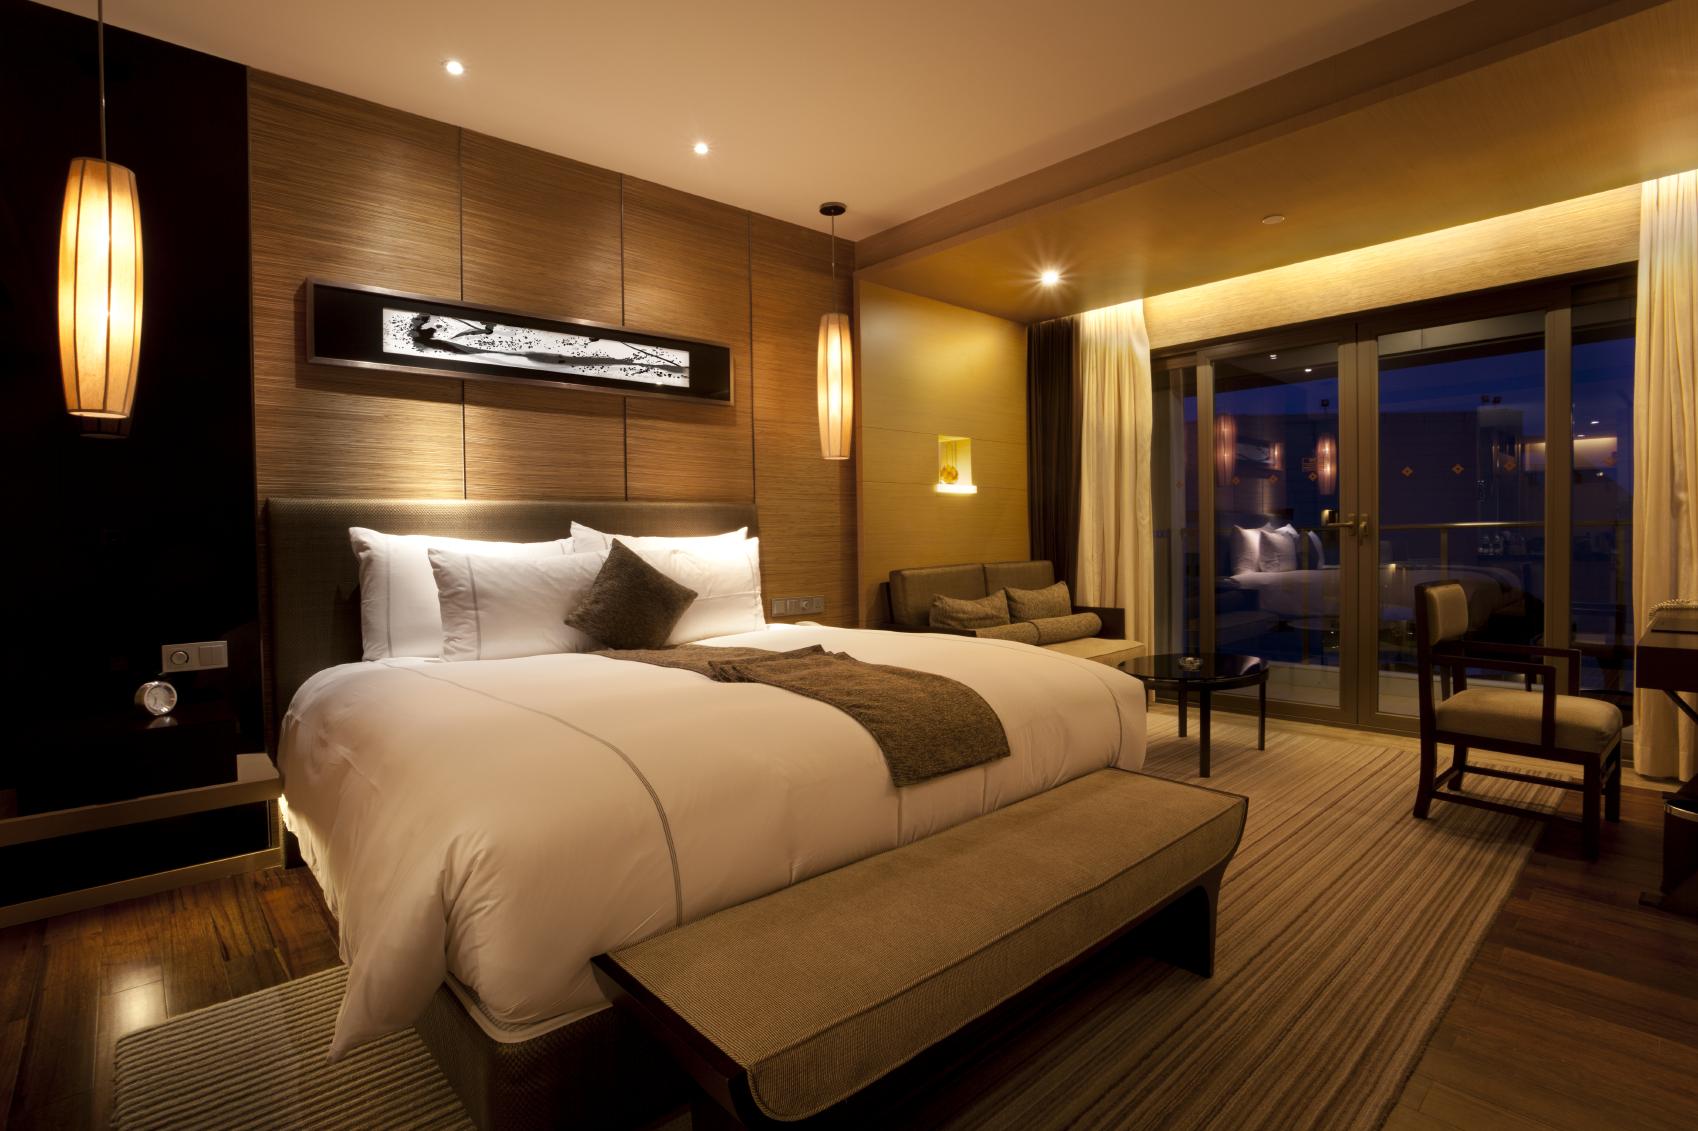 HOTEL/HOSPITALITY